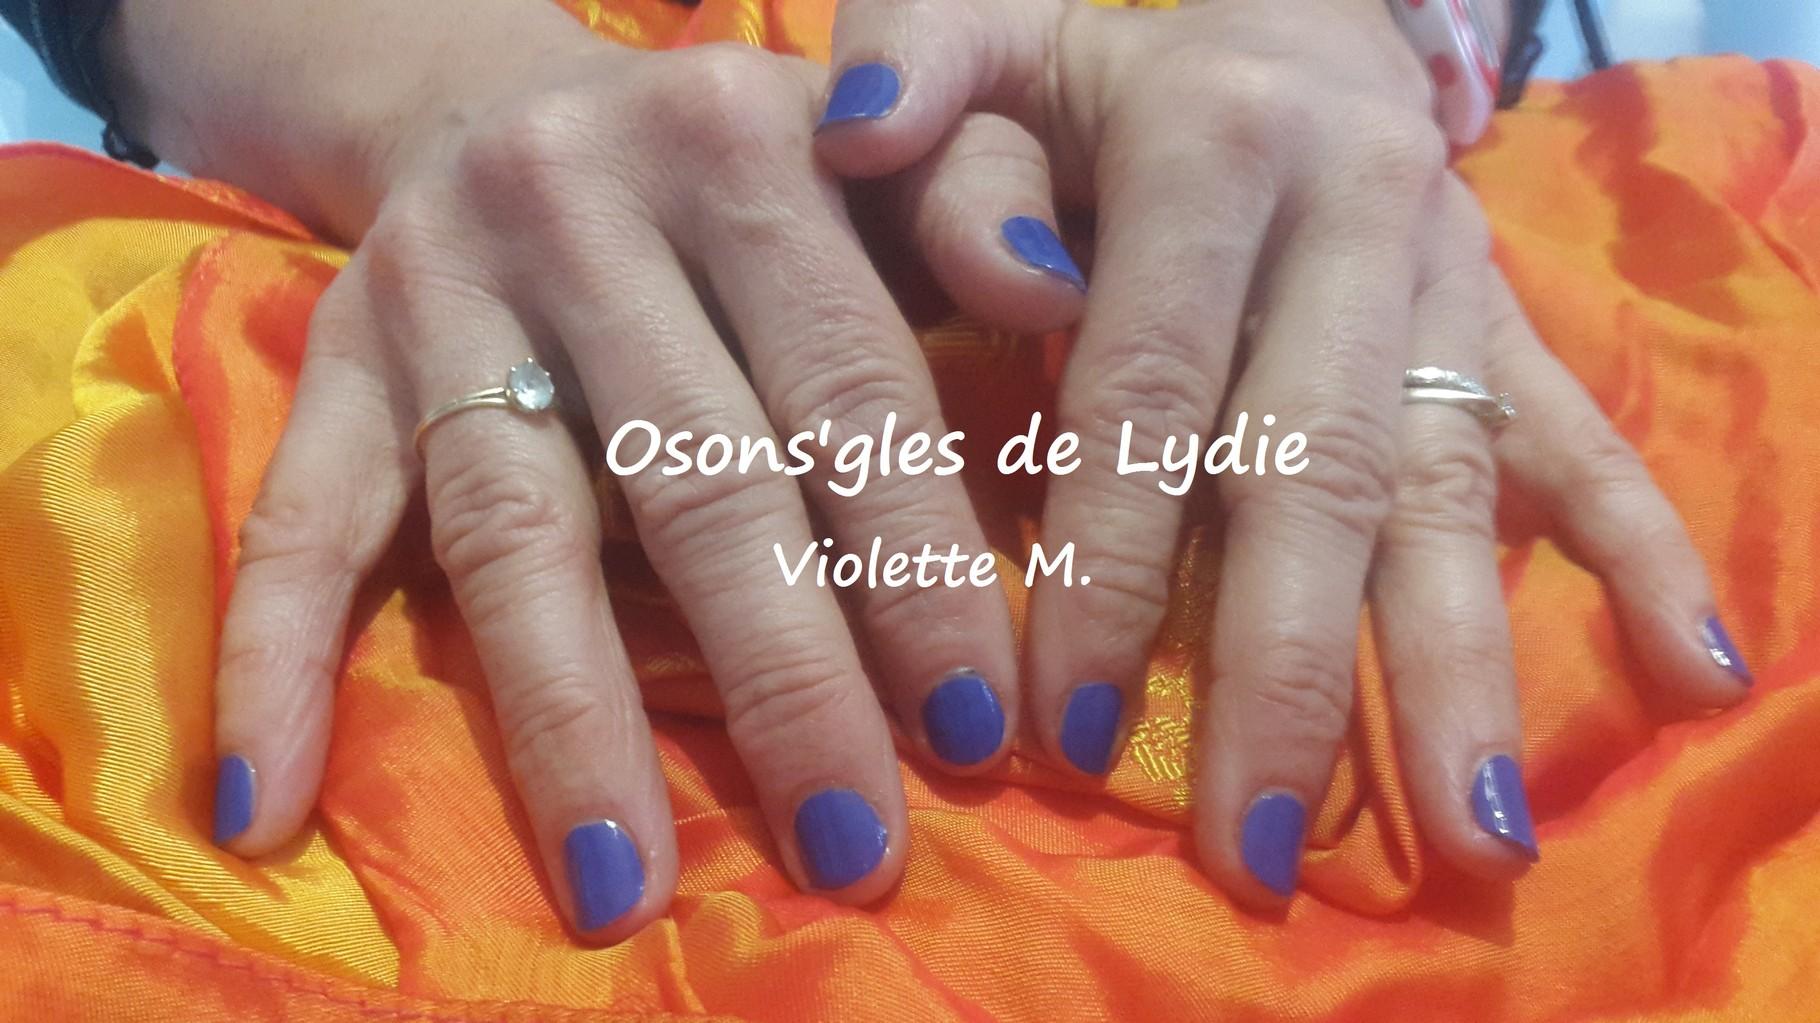 Vernis simple Bleu : Violette